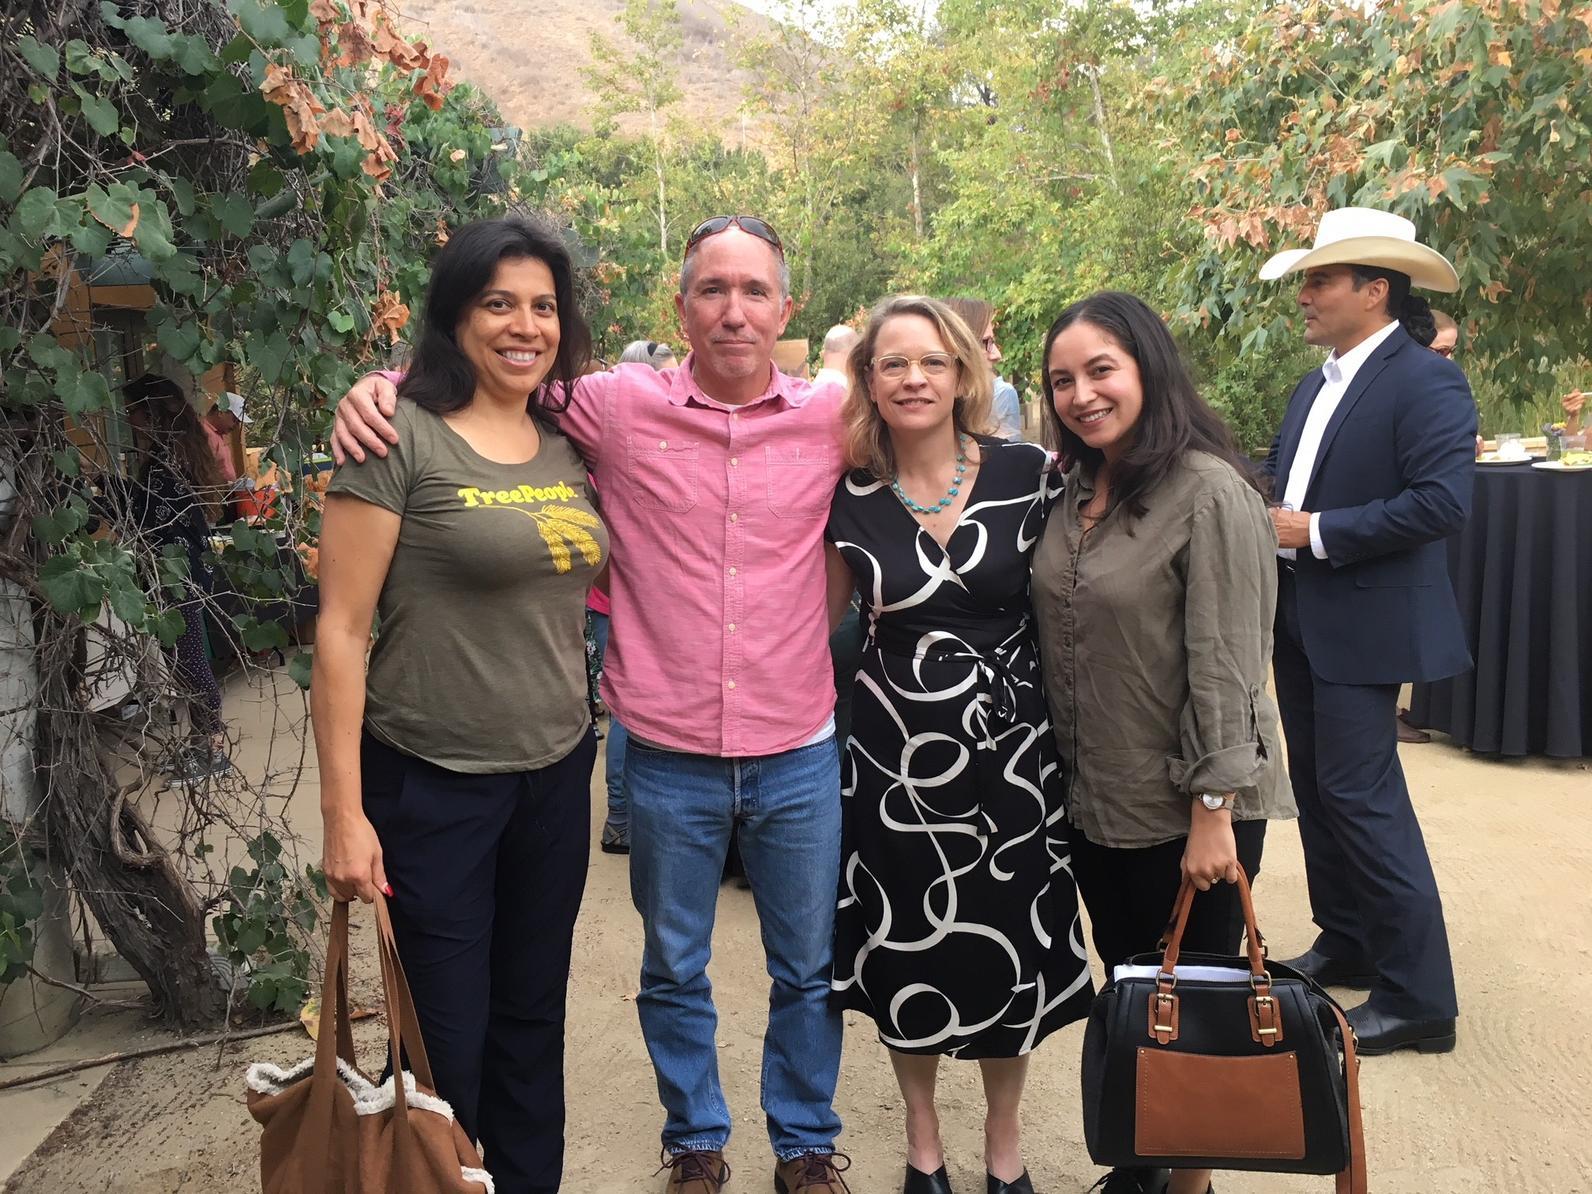 Cindy Montañez (TreePeople), Dan Knapp (LBCC), Sarah Rose, Sarah Rascon (MRCA)